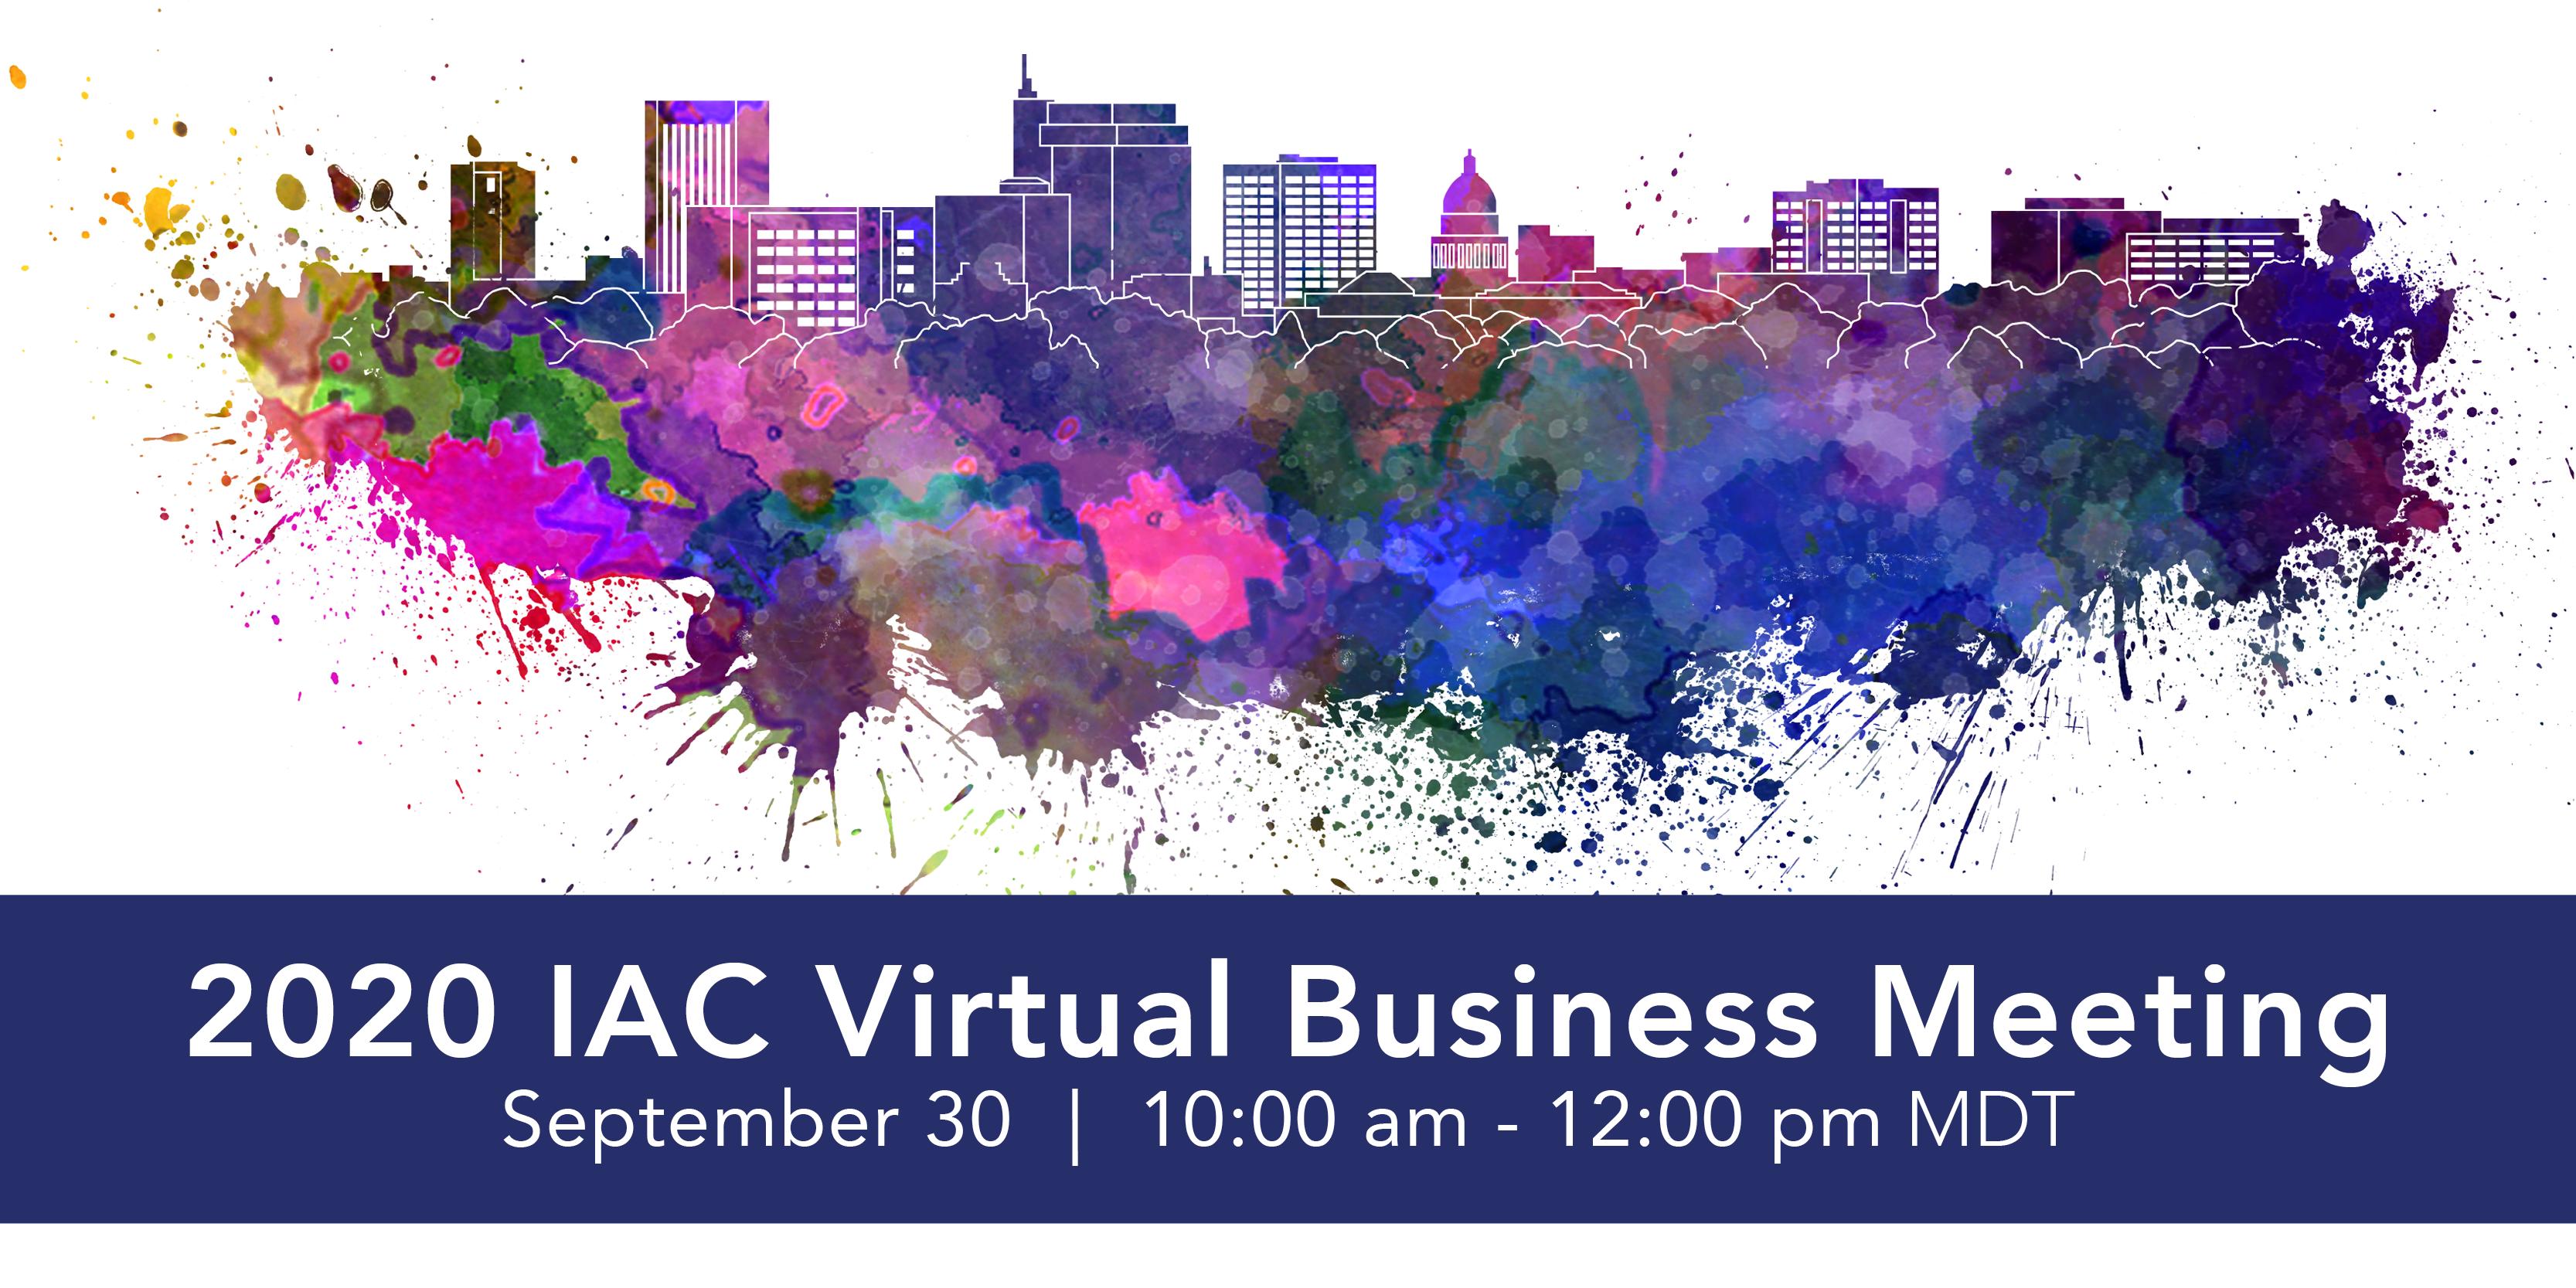 IAC Annual Business Meeting